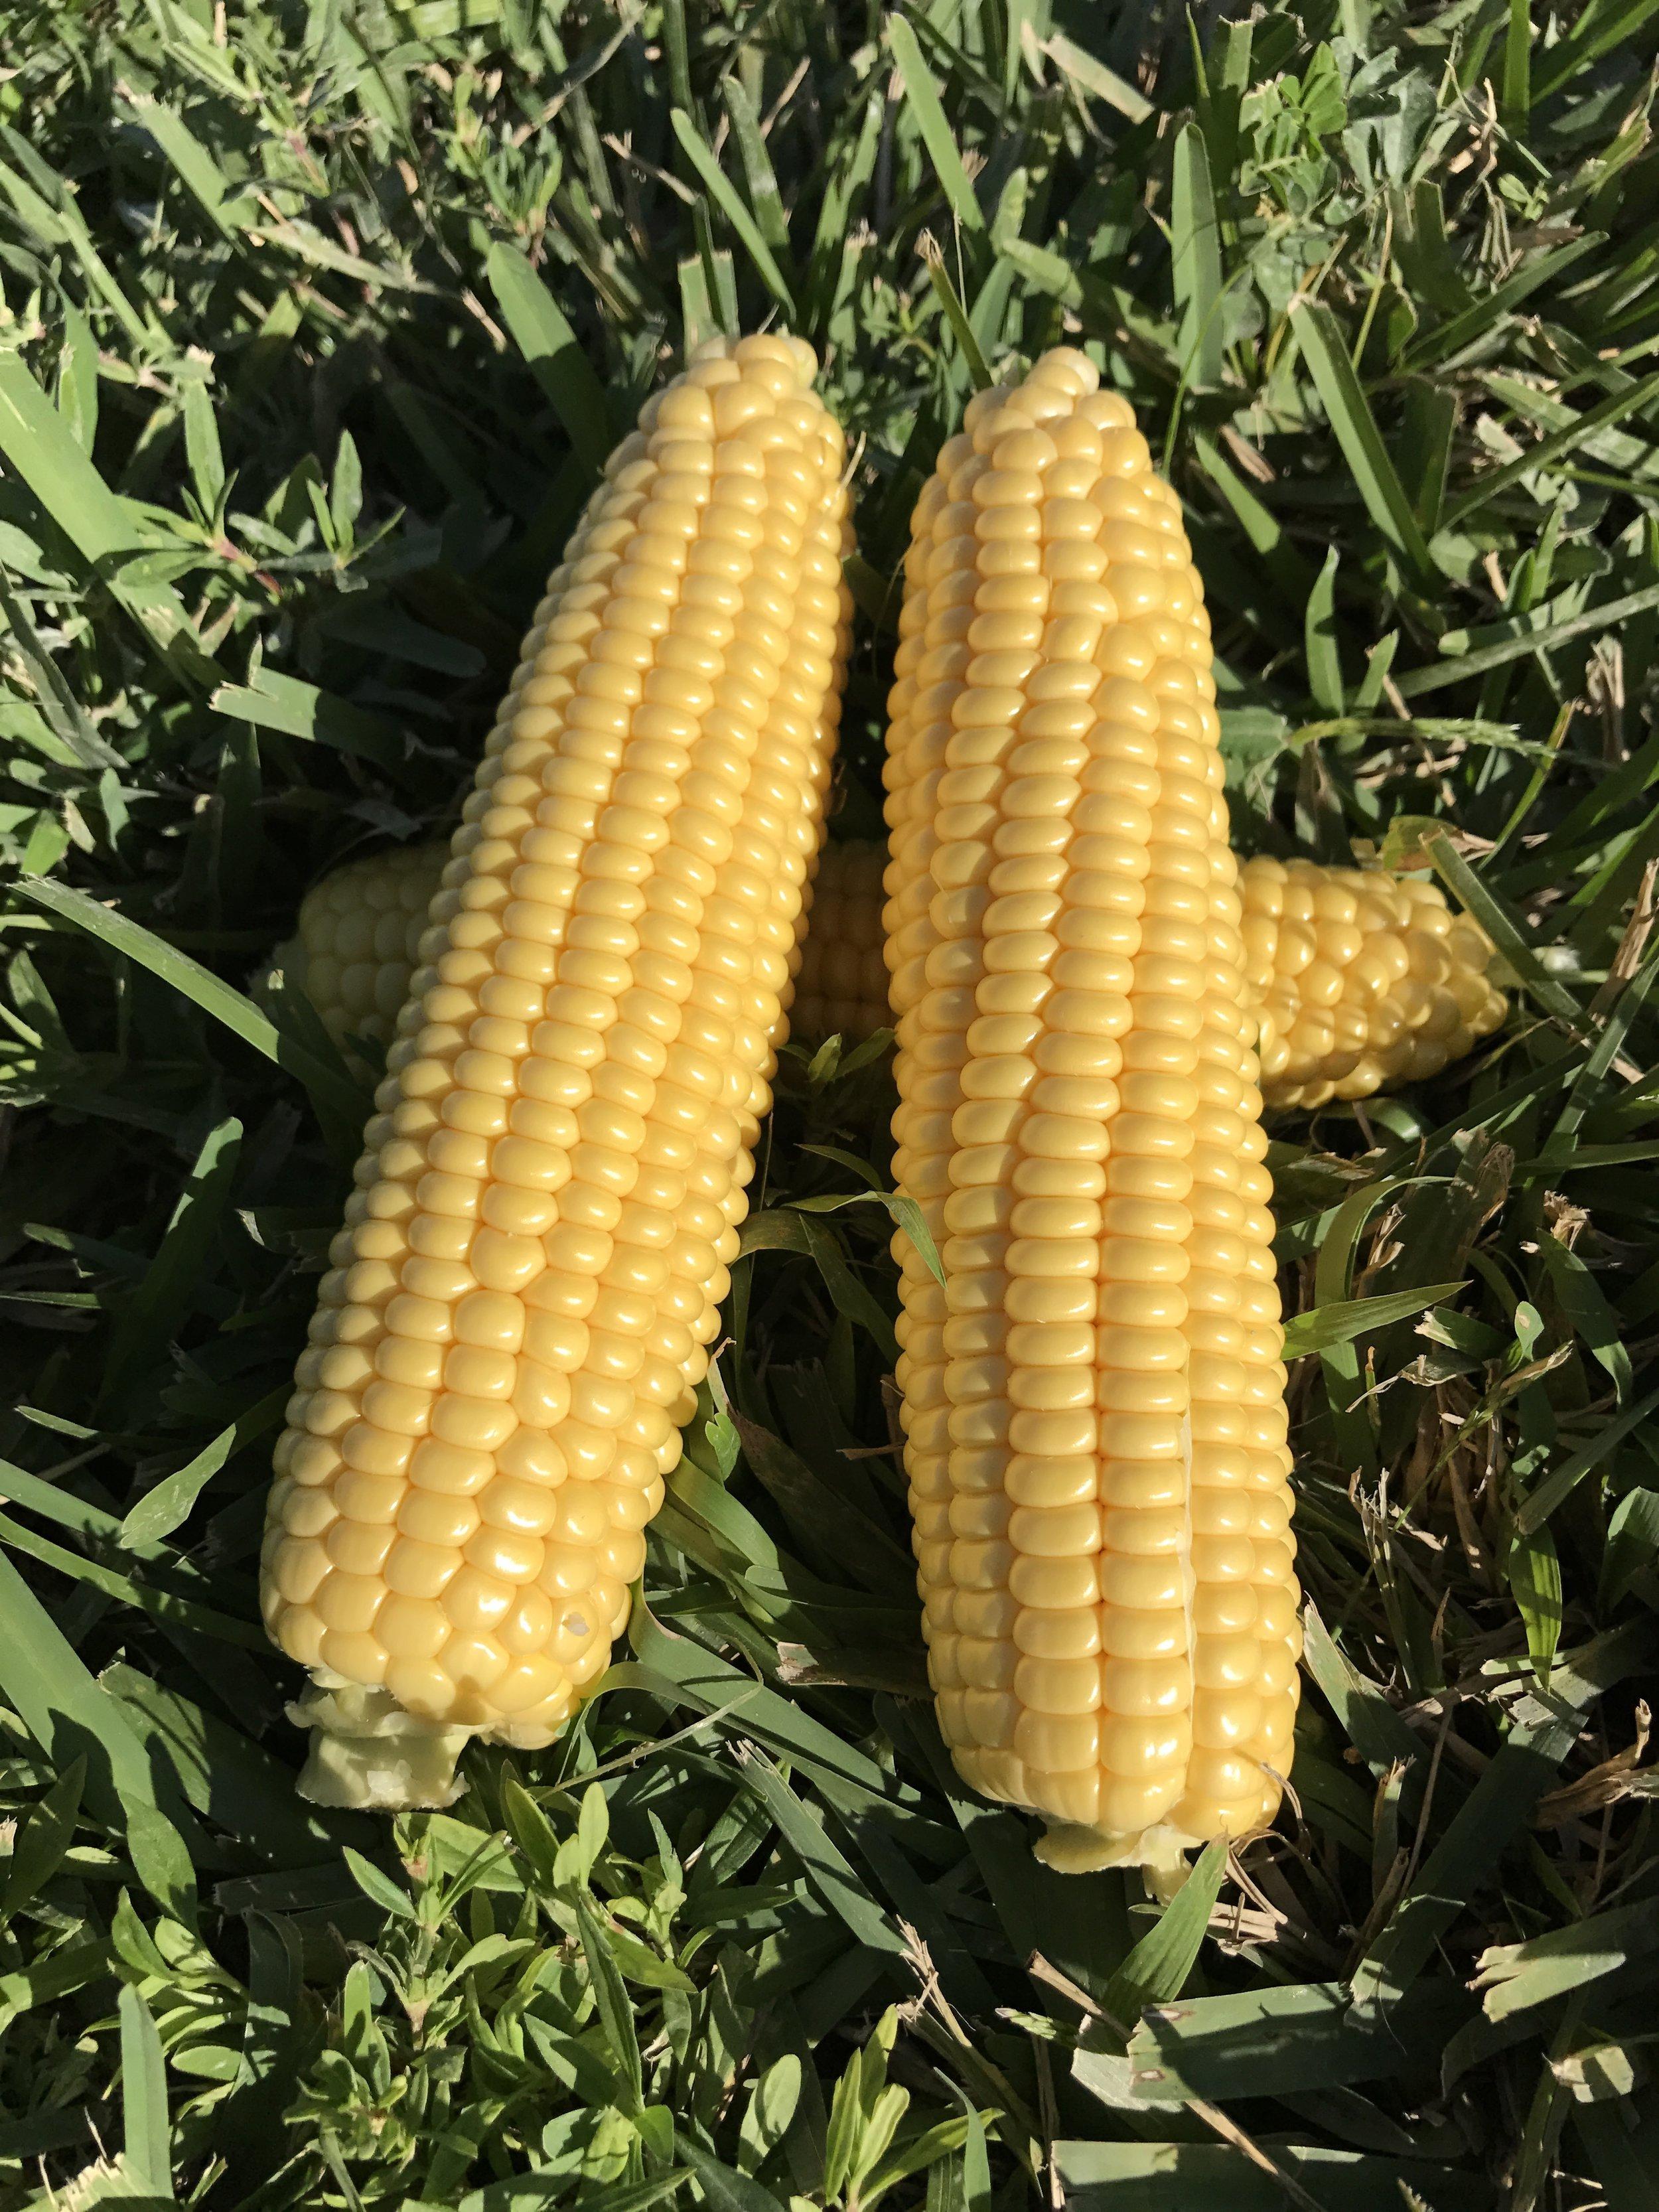 South Florida Fresh Winter Yellow Sweet Corn